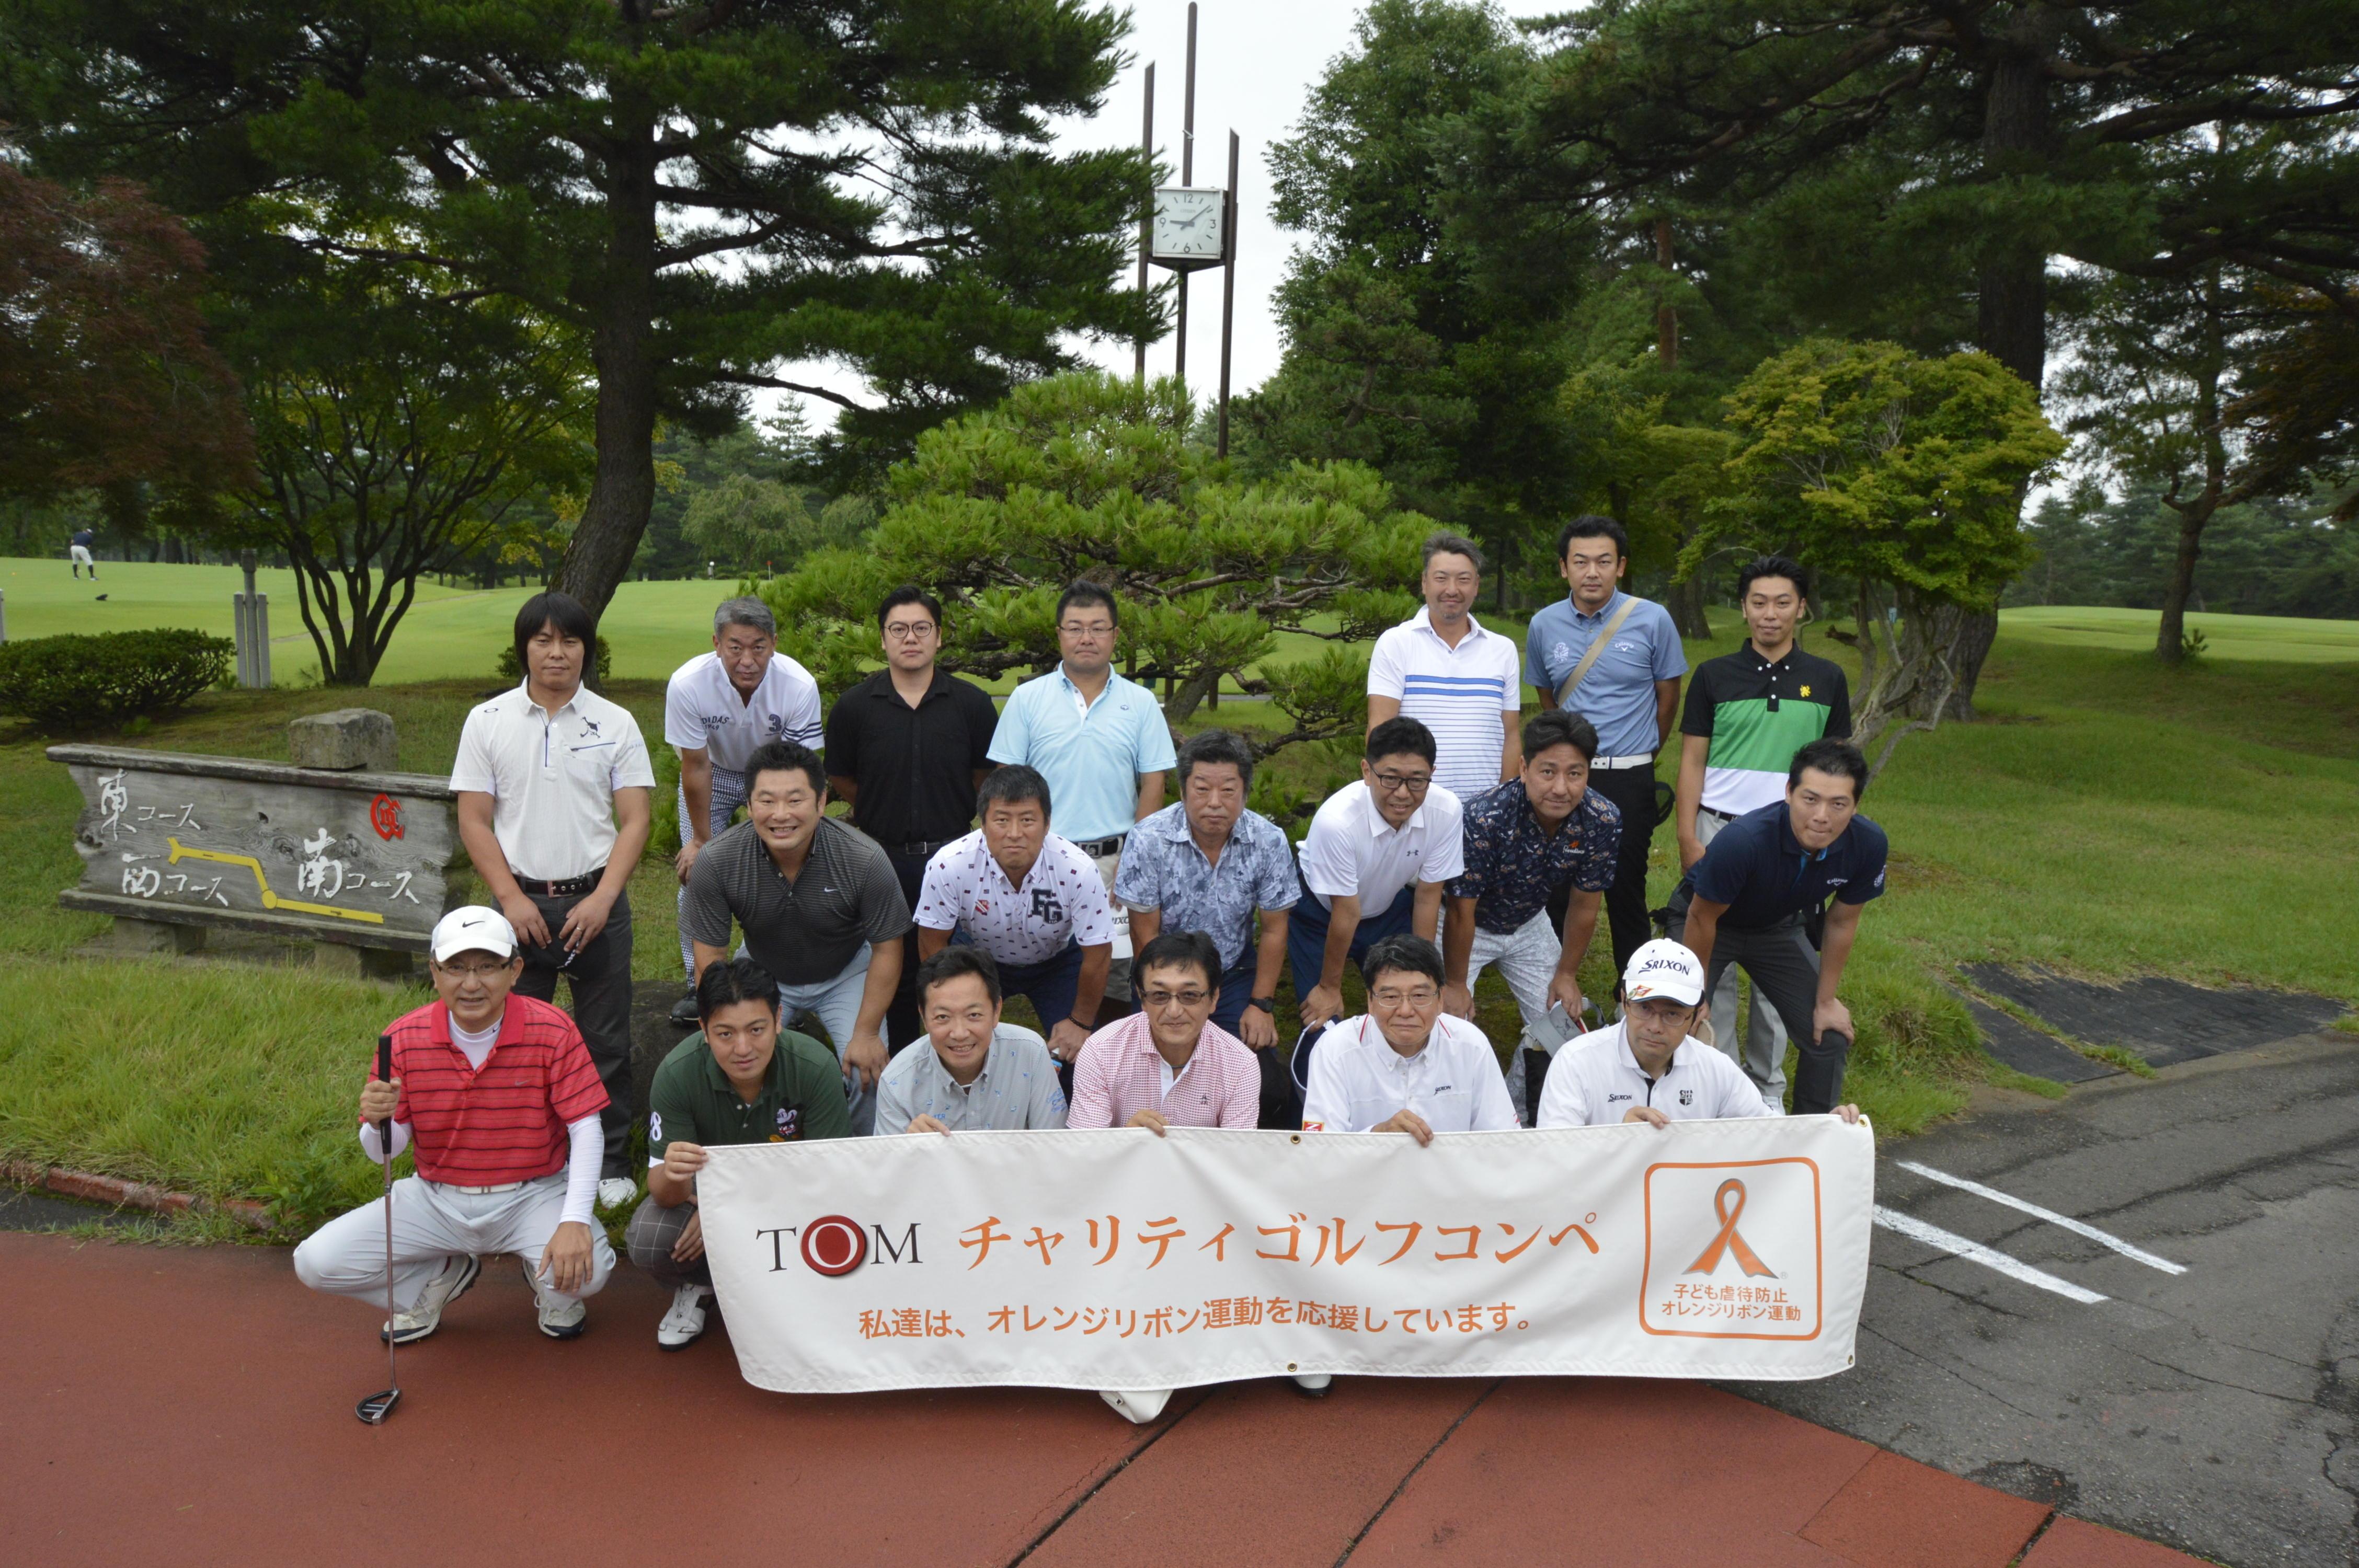 http://www.orangeribbon.jp/info/enterprise/bf706413395e841b09d7569989cba4cda6f0bc41.JPG